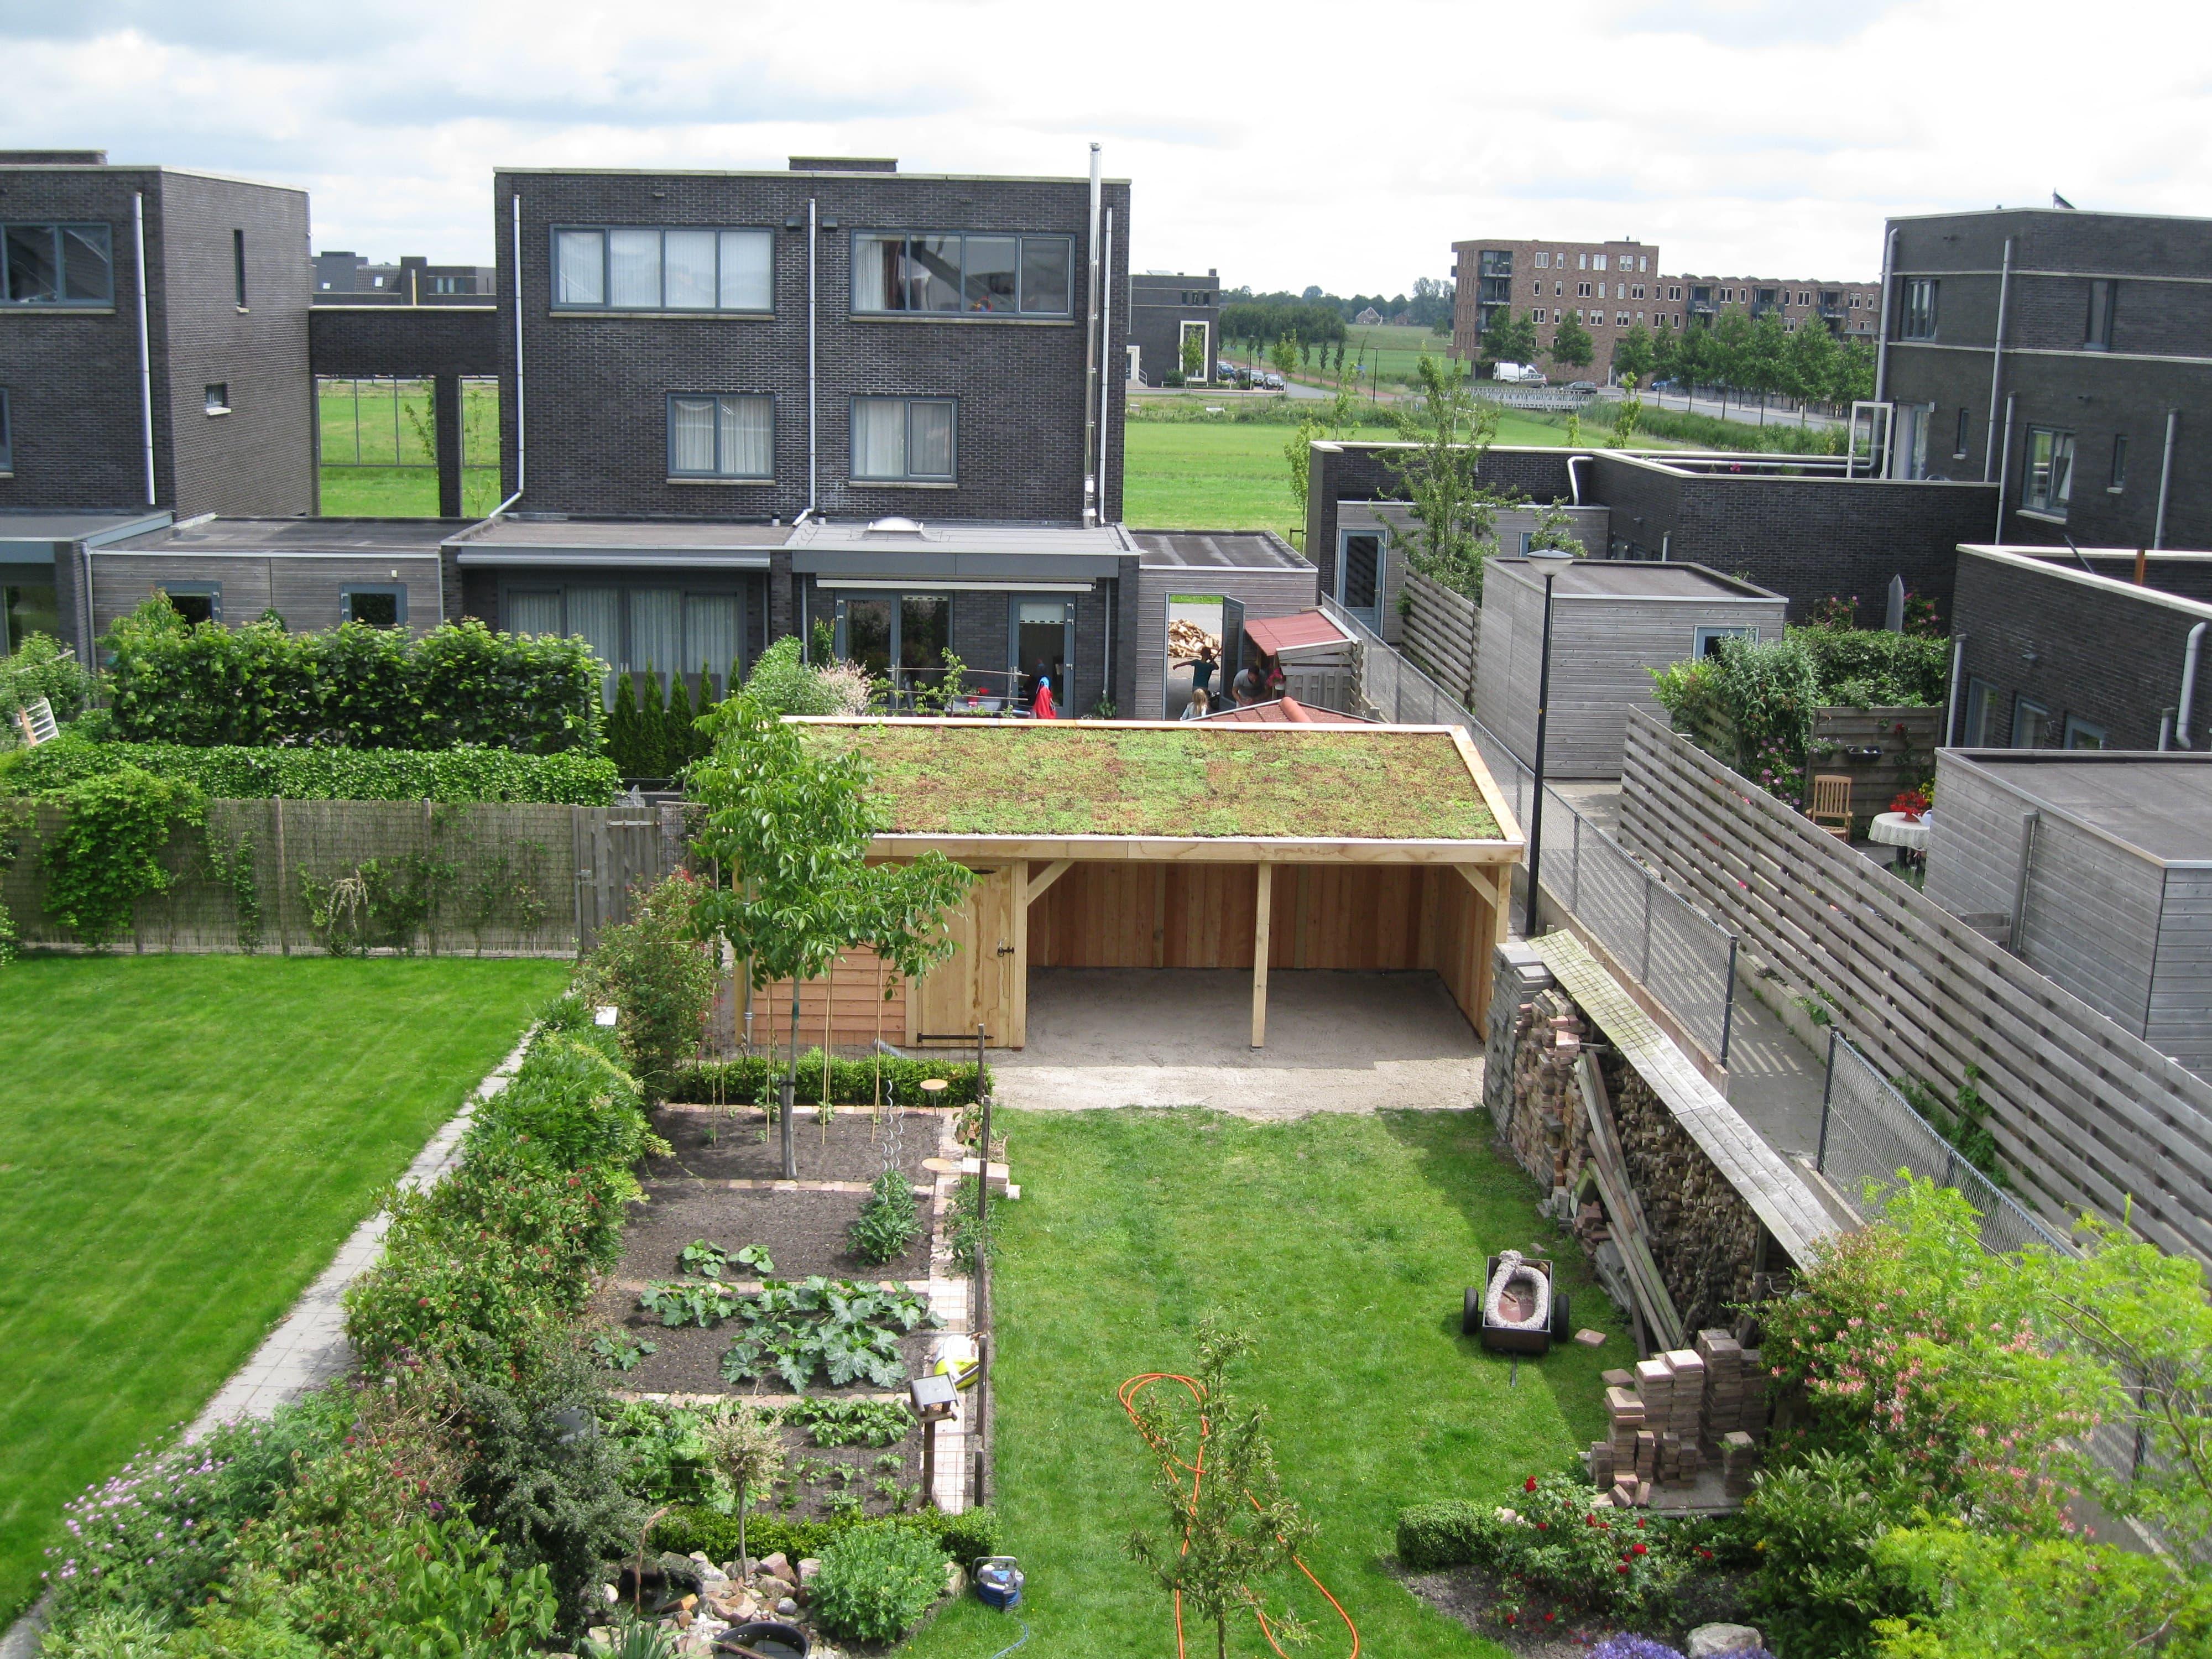 Houten-tuinhuis-met-tuinkamer-groendak-1-min - tuinhuis met veranda 'groendak'